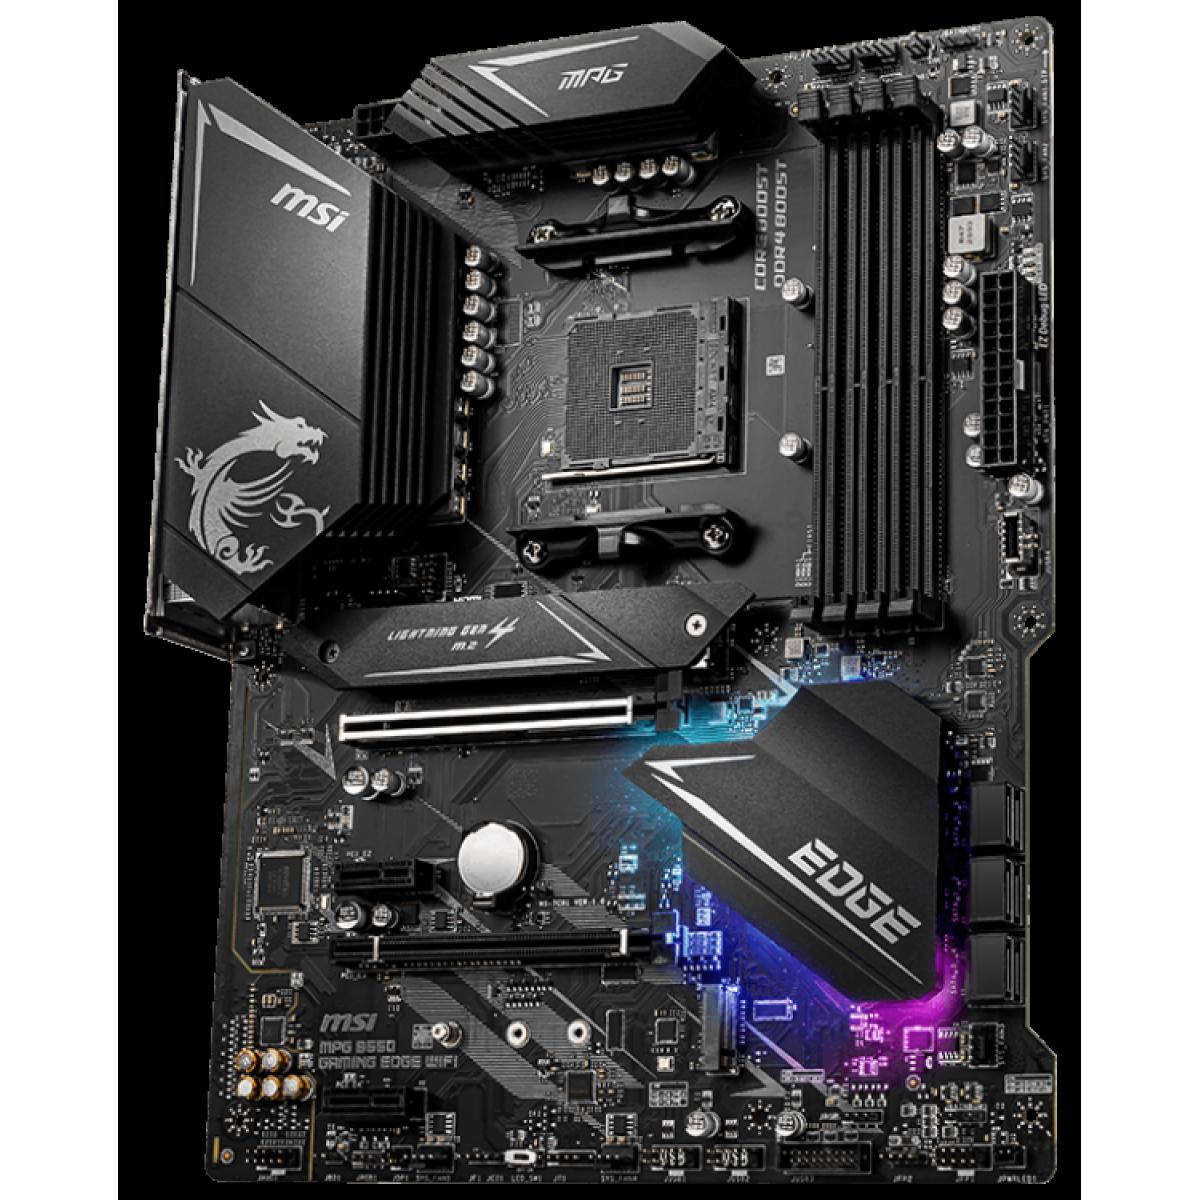 Placa Mãe MSI, MPG B550 Gaming EDGE WIFI, Chipset B550, AMD AM4, ATX, DDR4